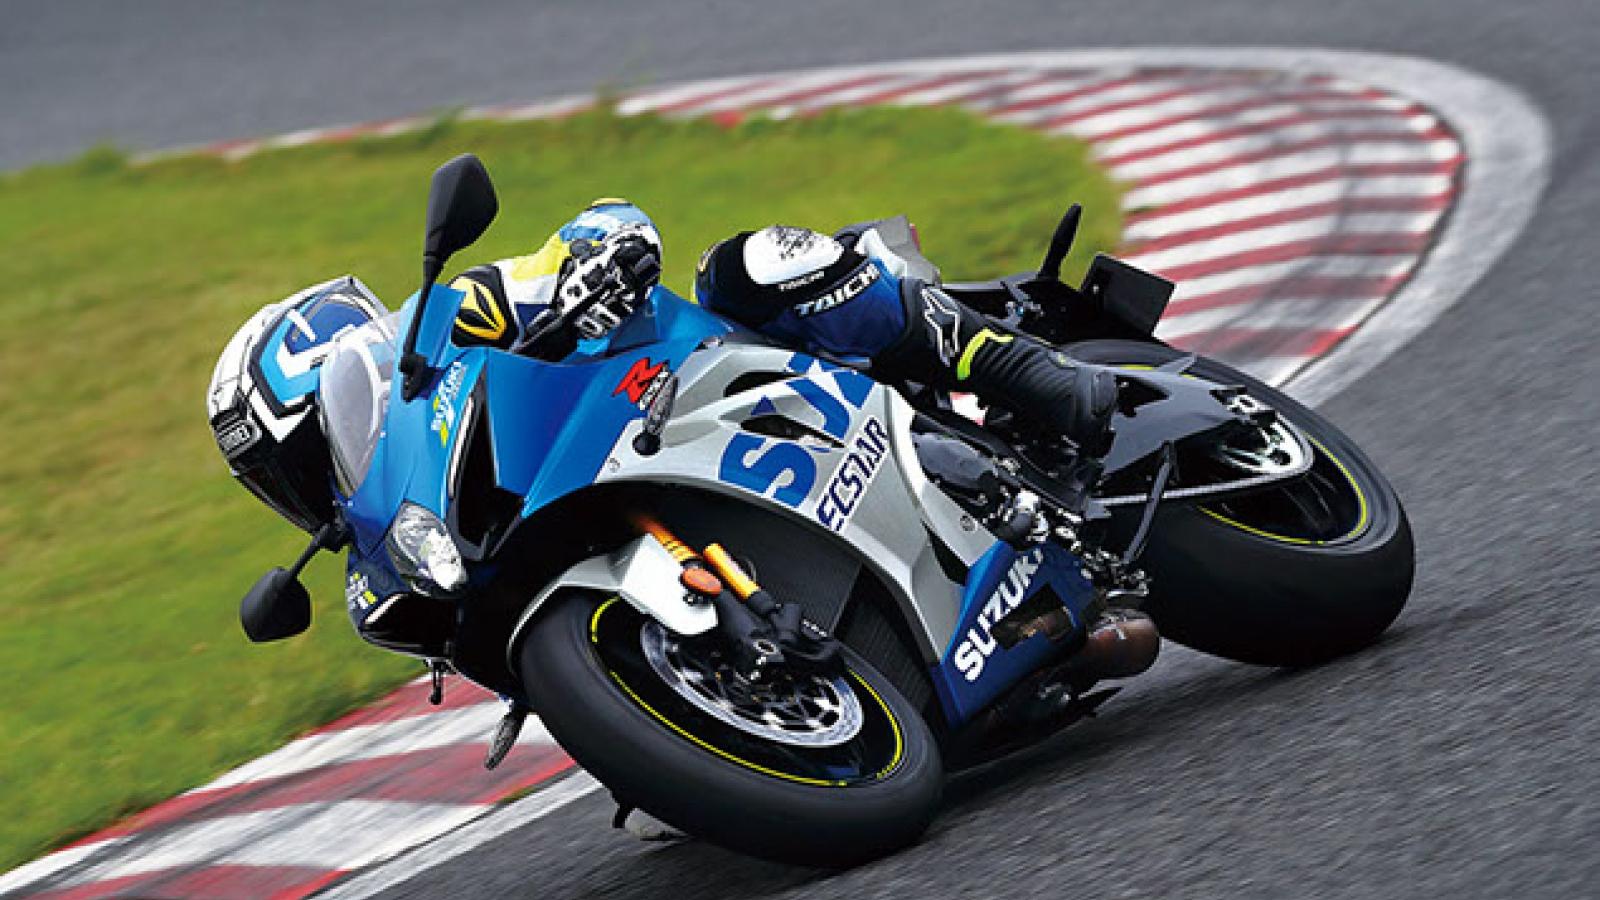 Suzuki Motorcycles 2021 mở bán đặt trước tại Malaysia